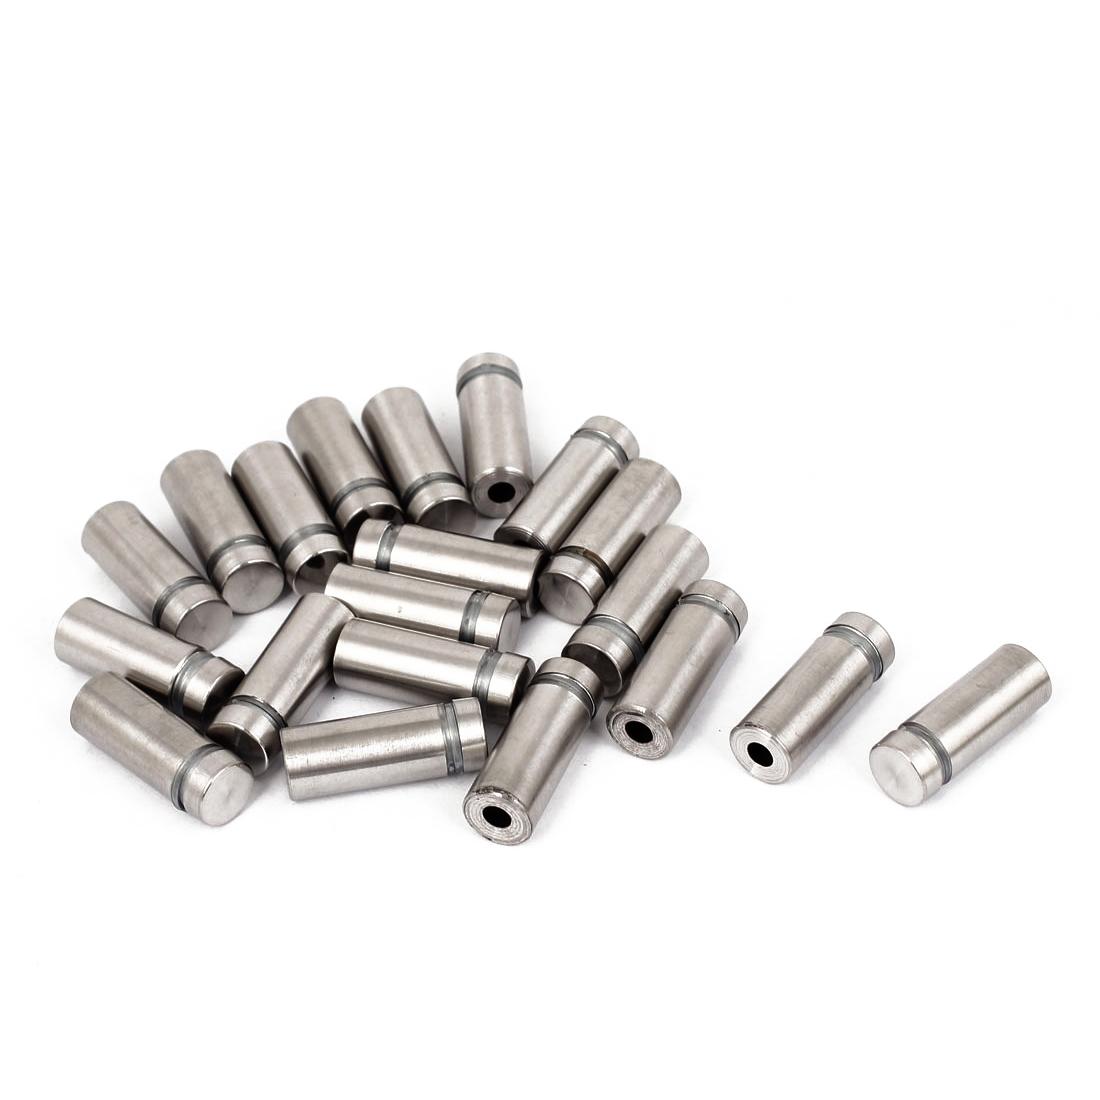 12mm x 30mm Stainless Steel Advertising Frameless Glass Standoff Pins 20pcs